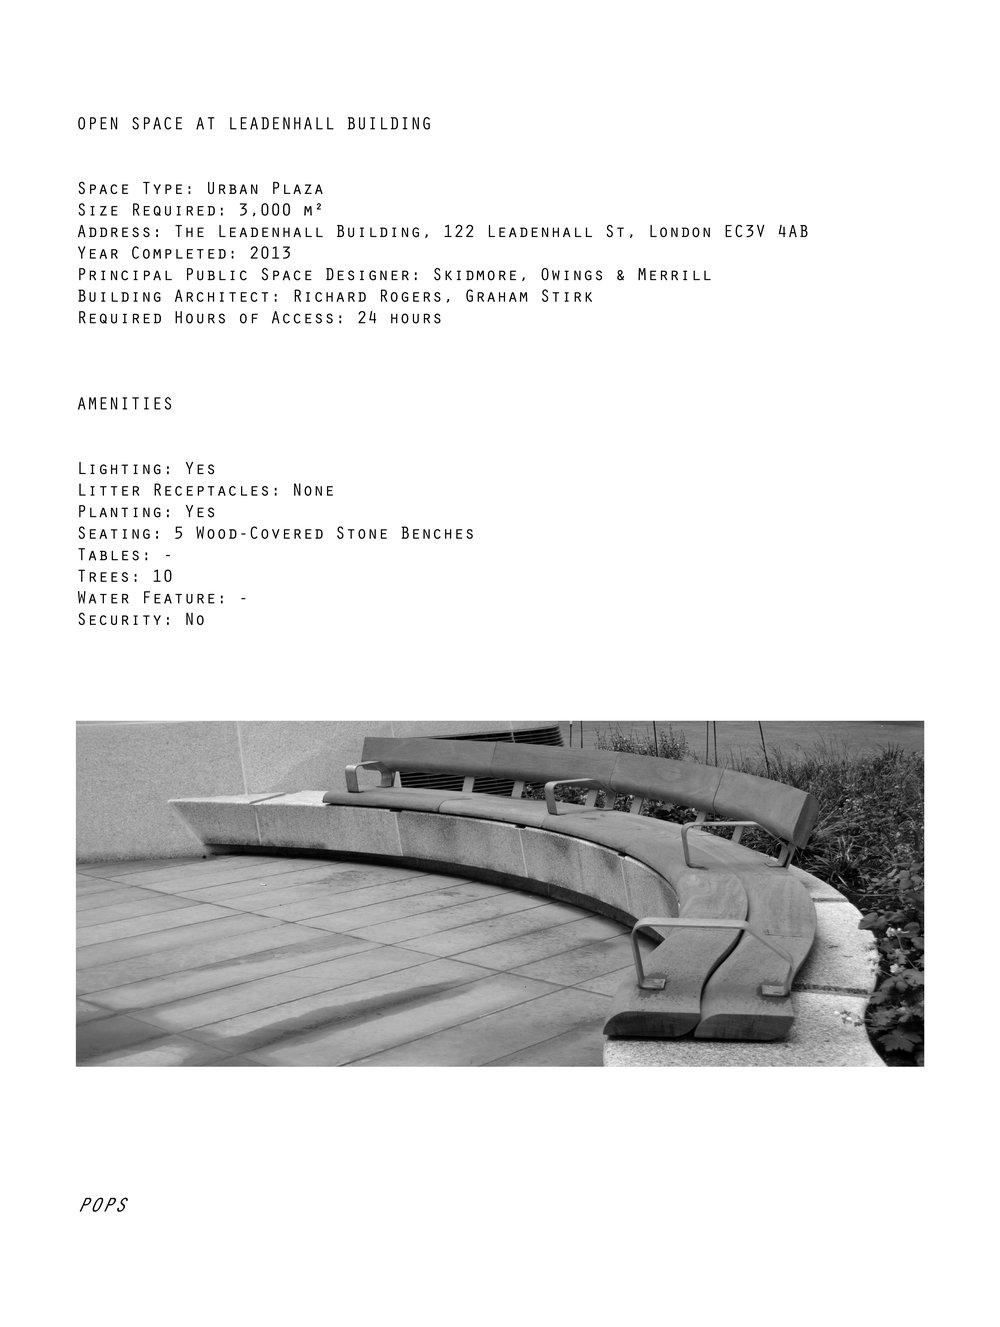 second book17.jpg